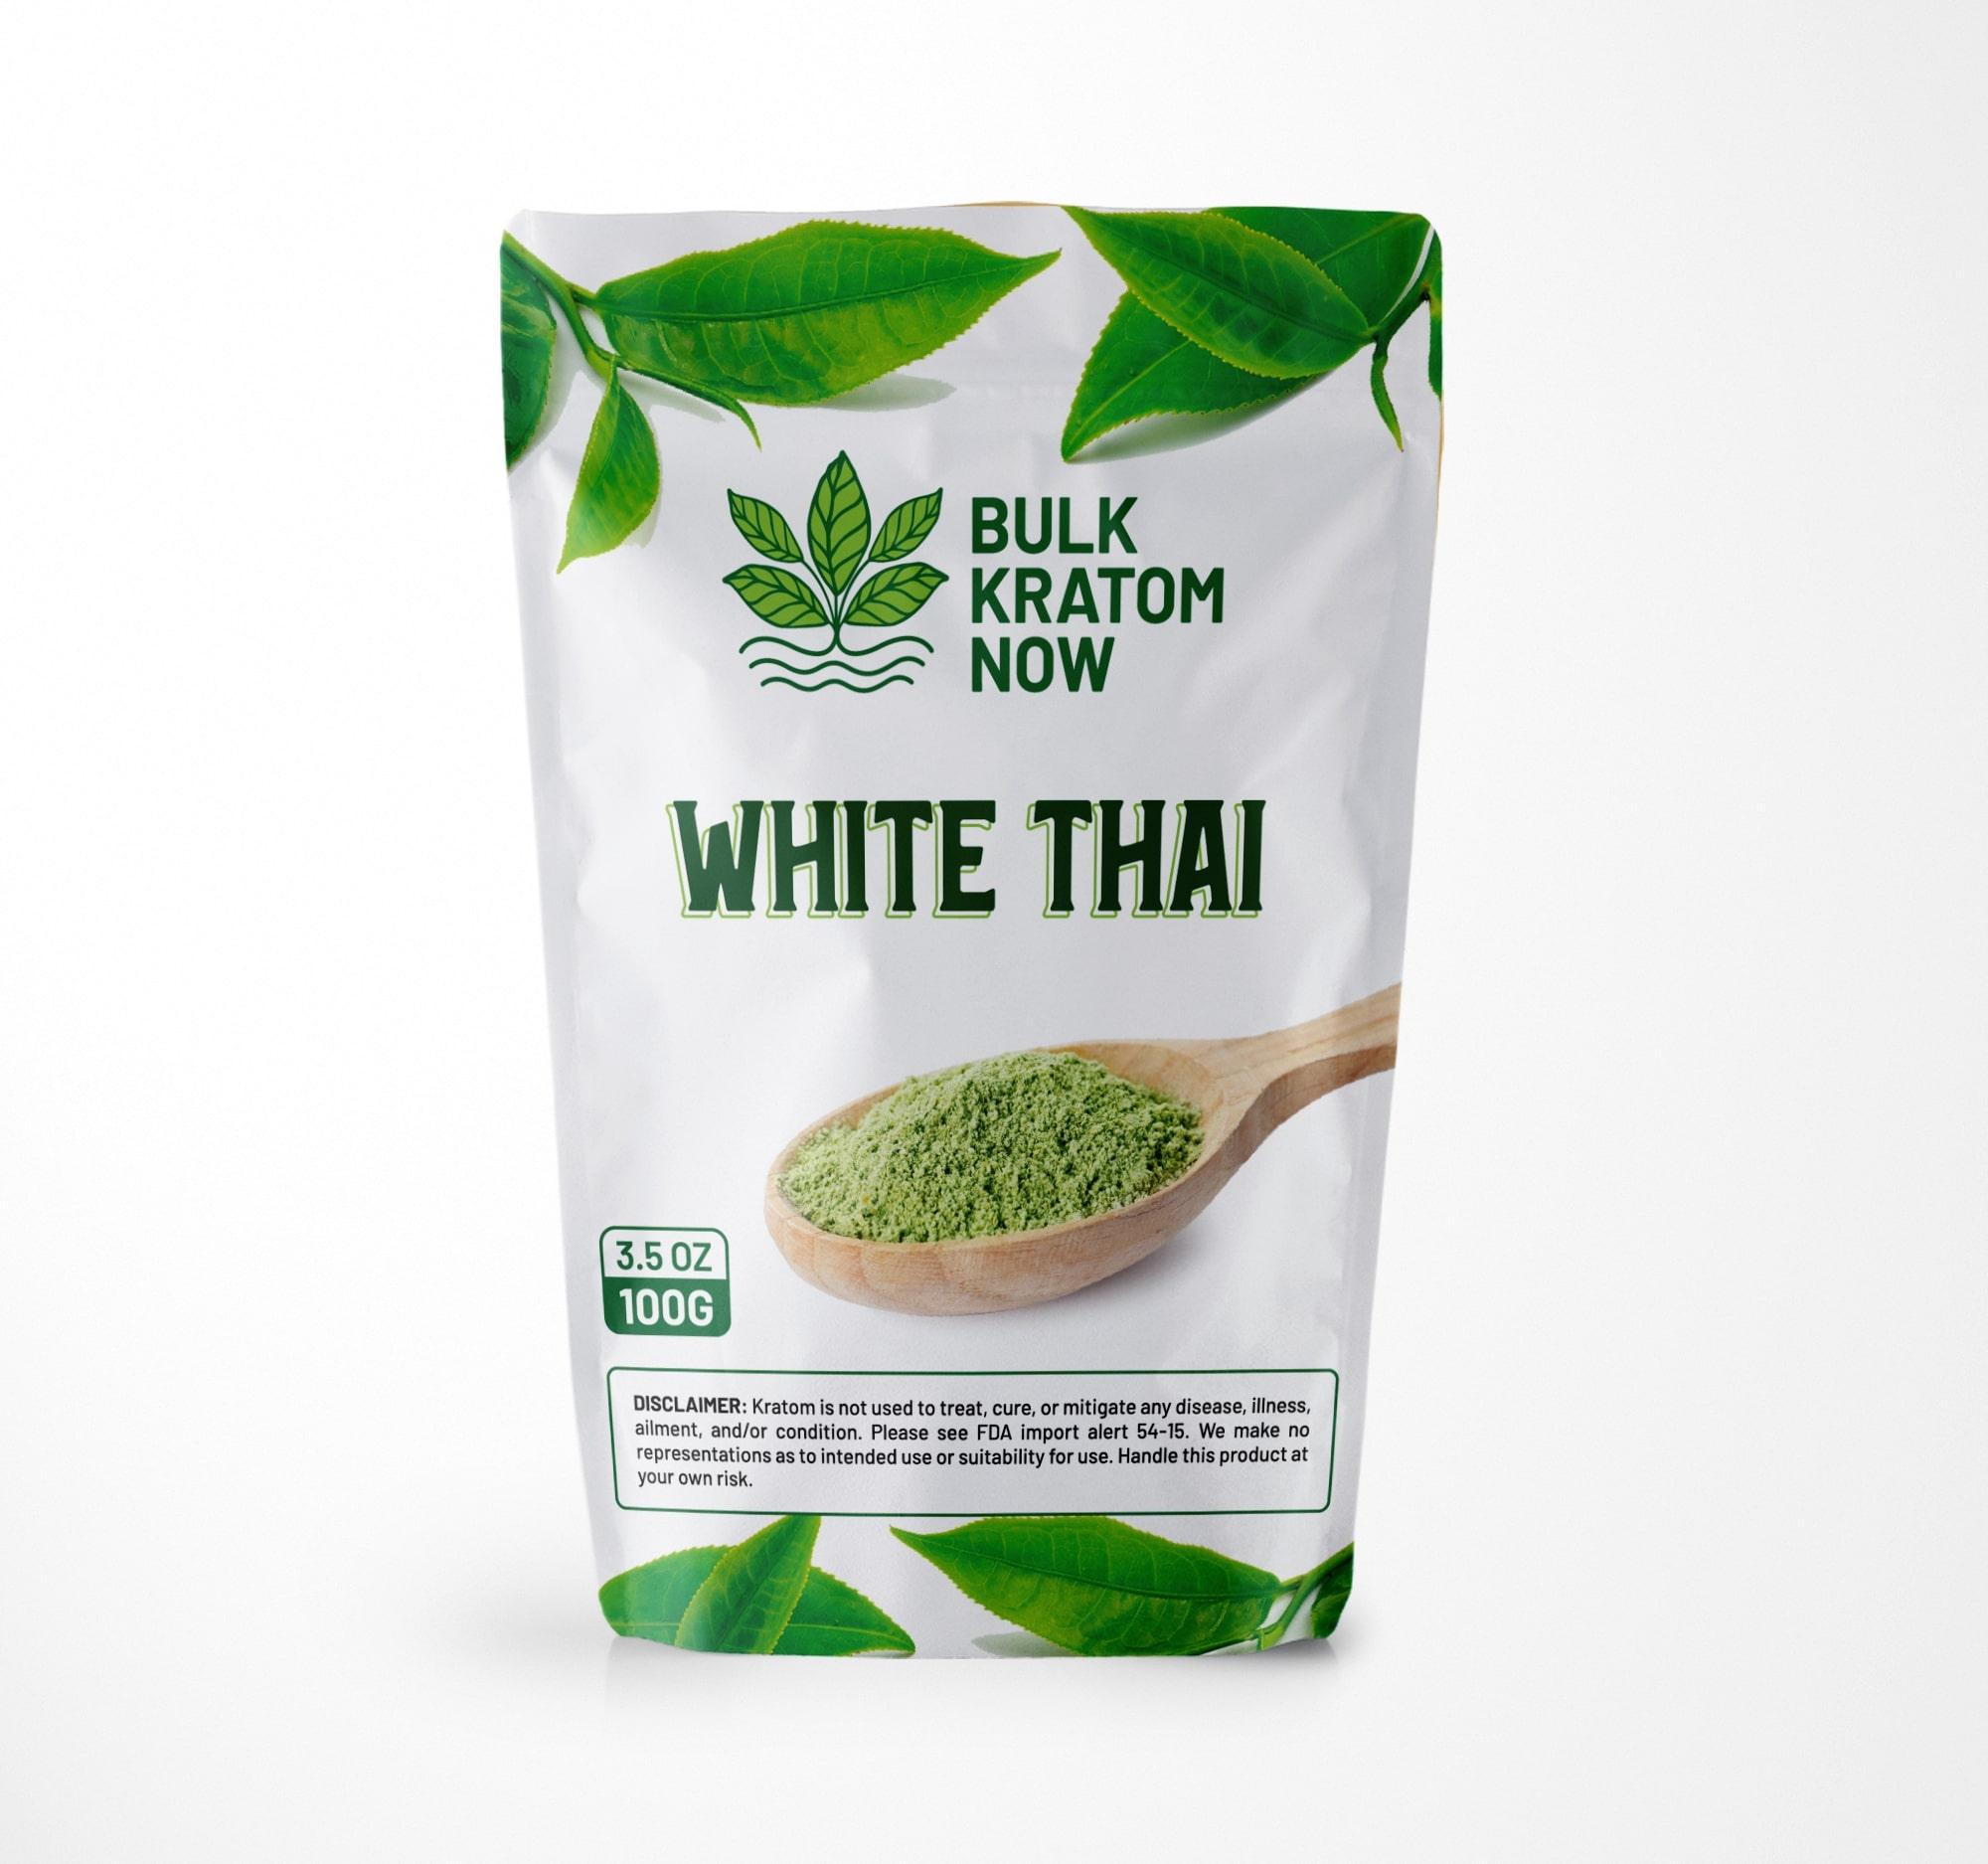 White Thai Bulk Kratom